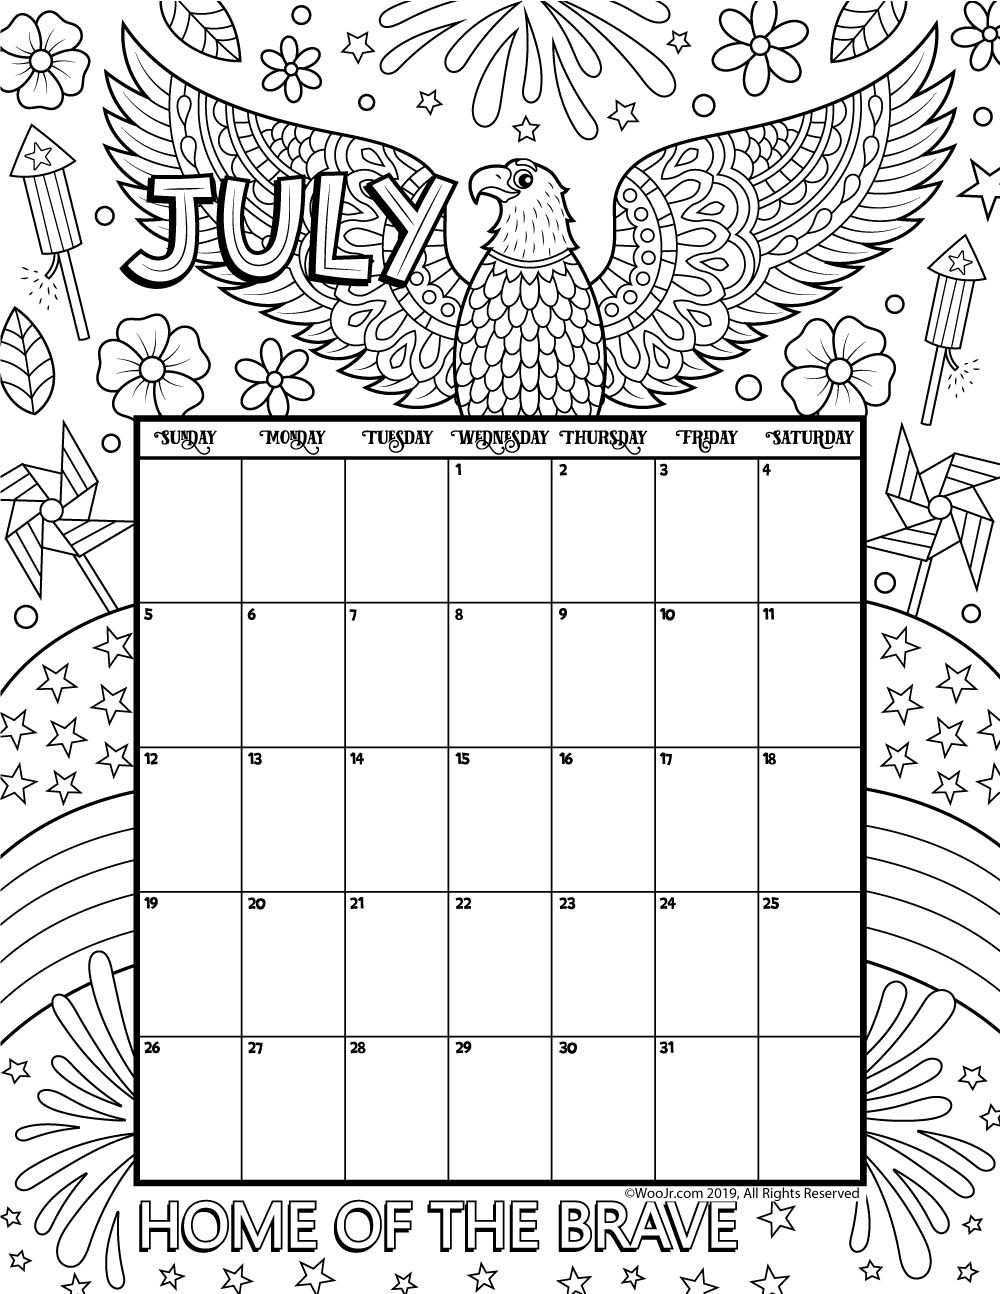 July 2020 Coloring Calendar | Coloring calendar, Kids ...